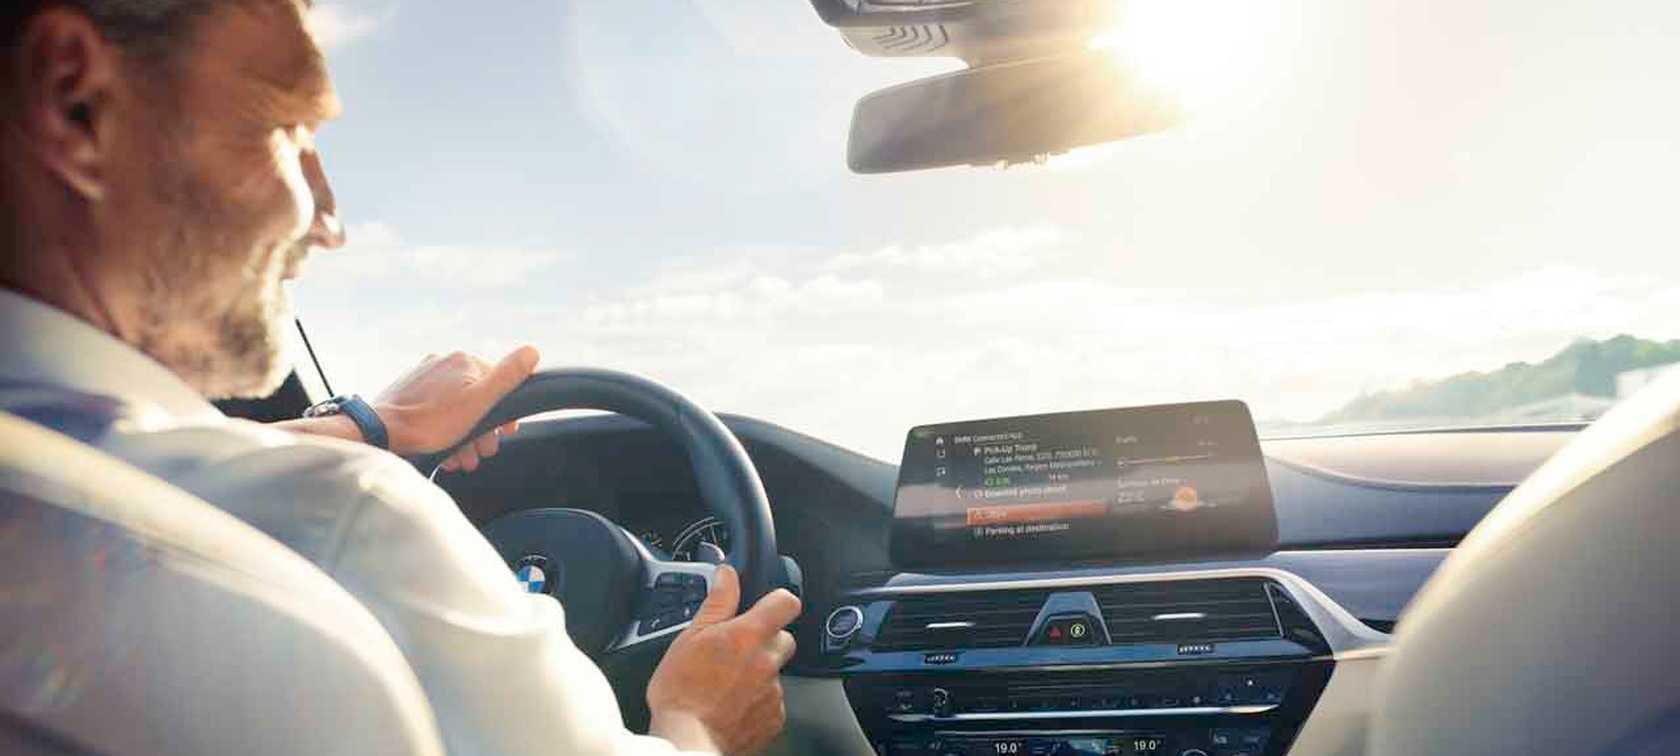 Техническое обслуживание BMW (ТО БМВ) в Москве - Техцентр BMW-E